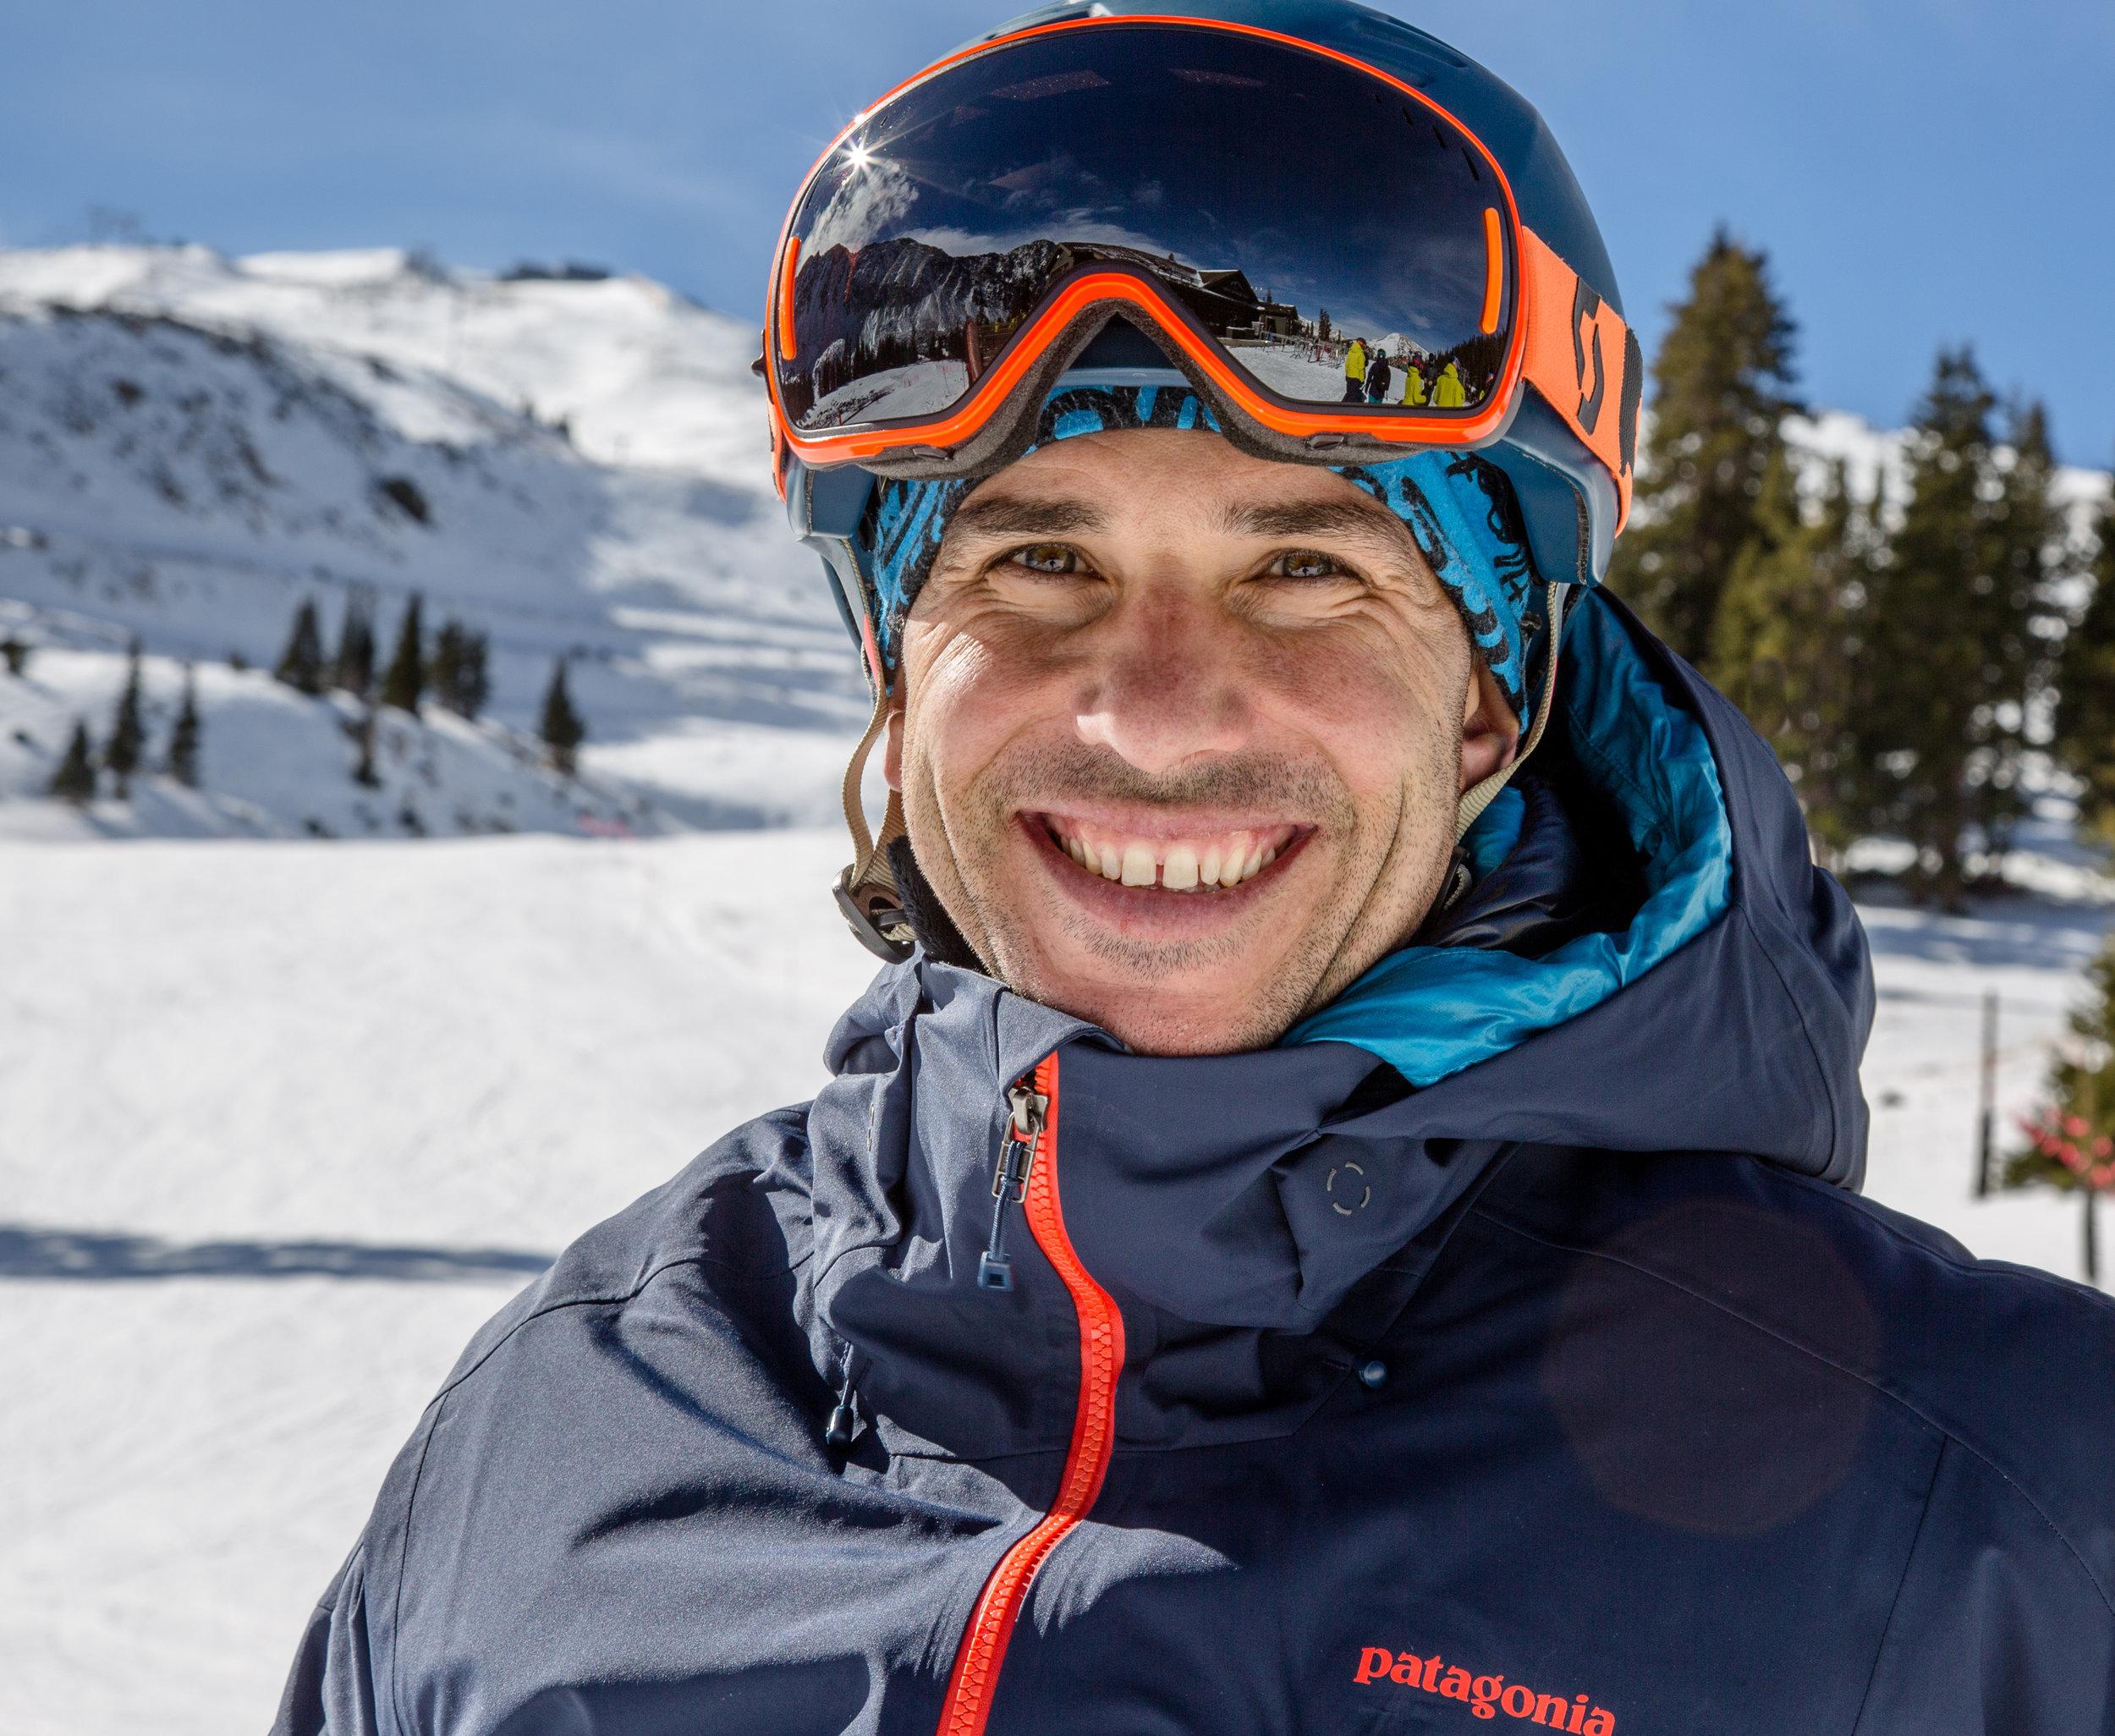 NICK HERRIN,  CEO, PROFESSIONAL SKI INSTRUCTORS OF AMERICA, AMERICAN ASSOCIATION OF SNOWBOARD INSTRUCTORS